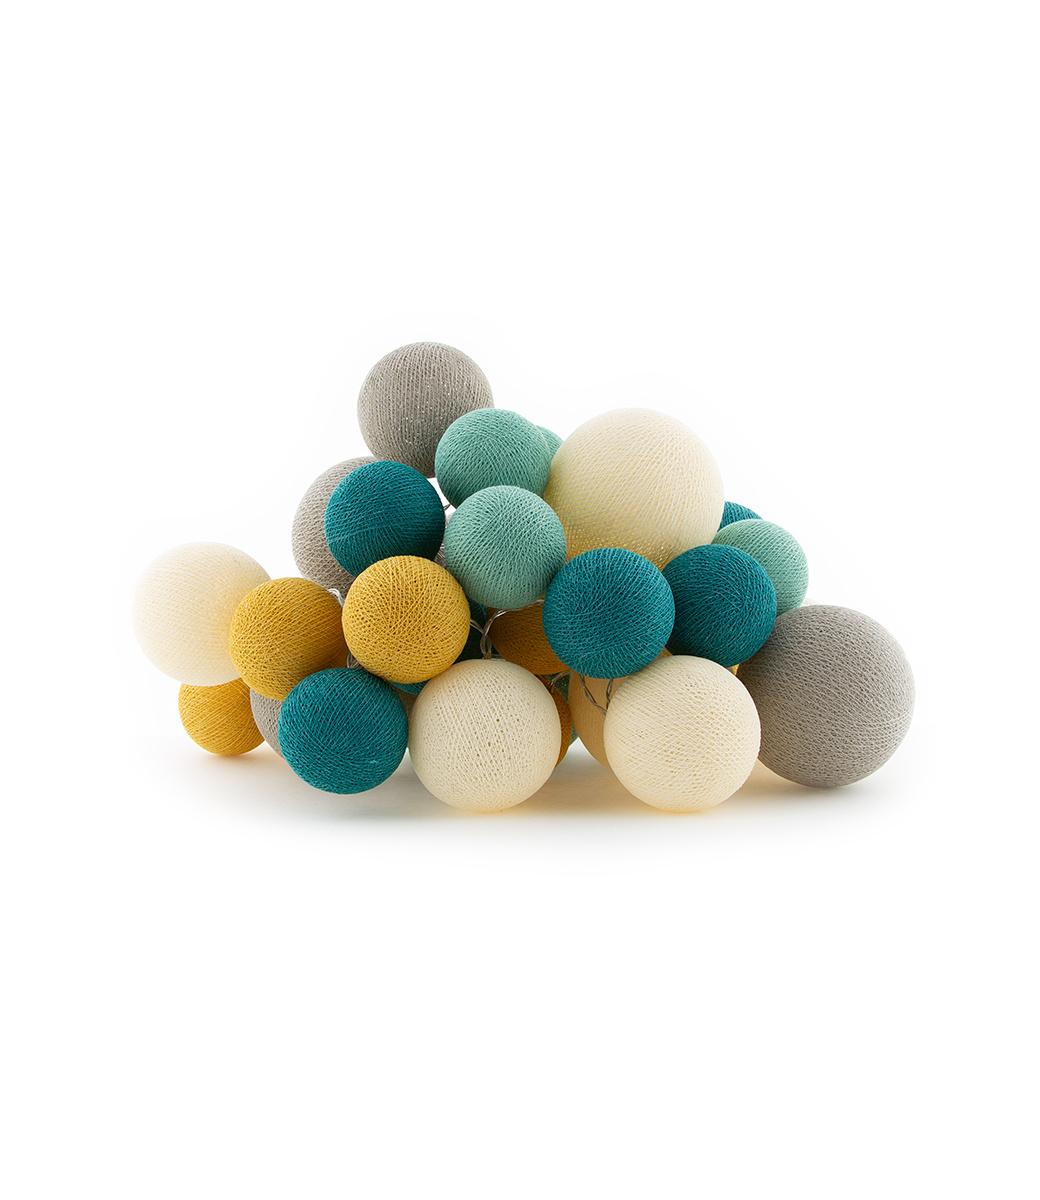 Cotton Ball Lights Premium lichtslinger beige en blauw - Ocean Green